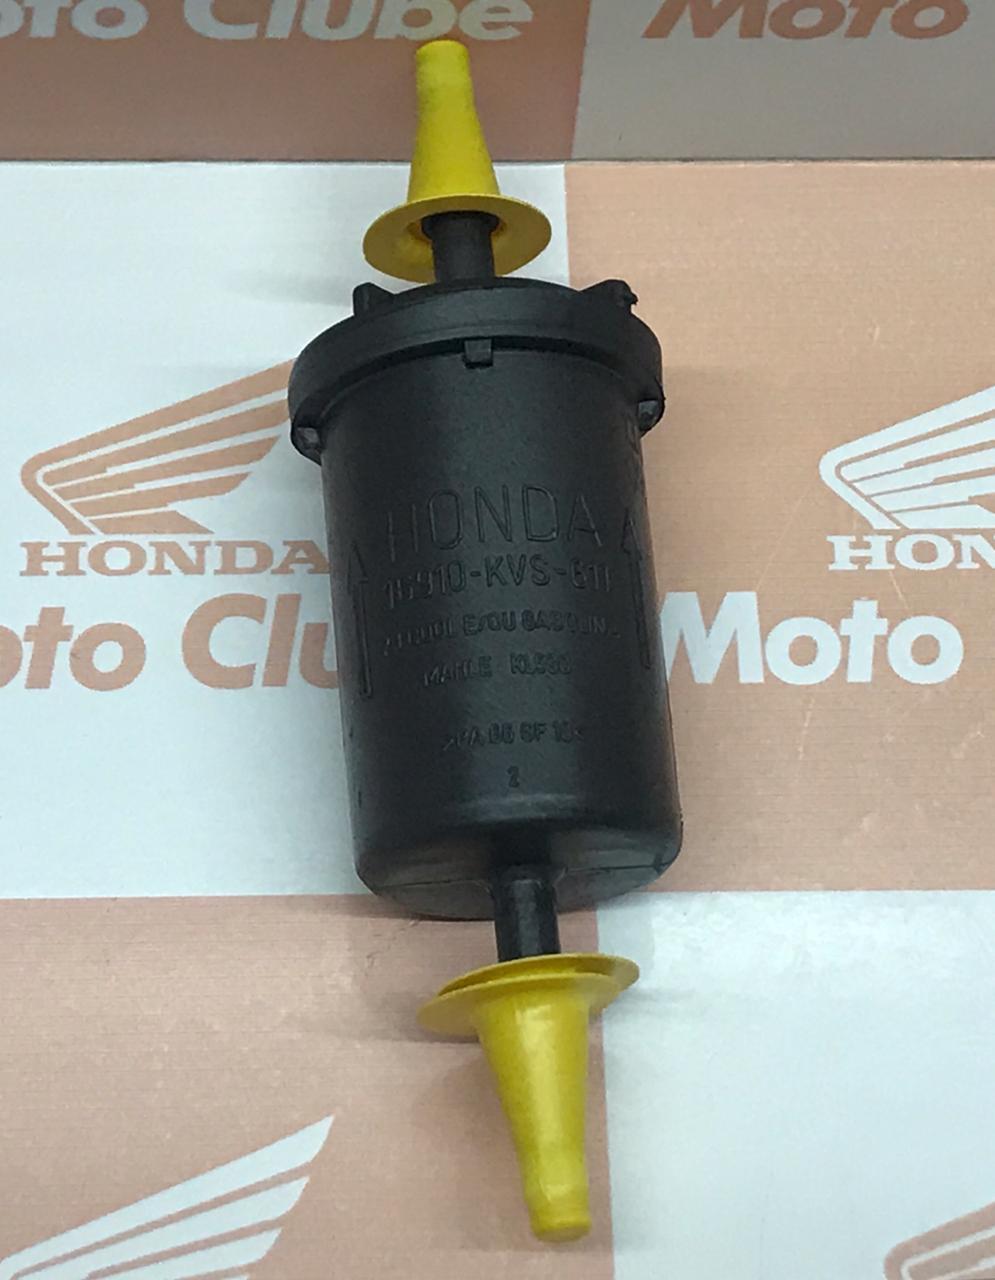 Sapata de Freio Traseiro + Filtro De Combustível Original Honda